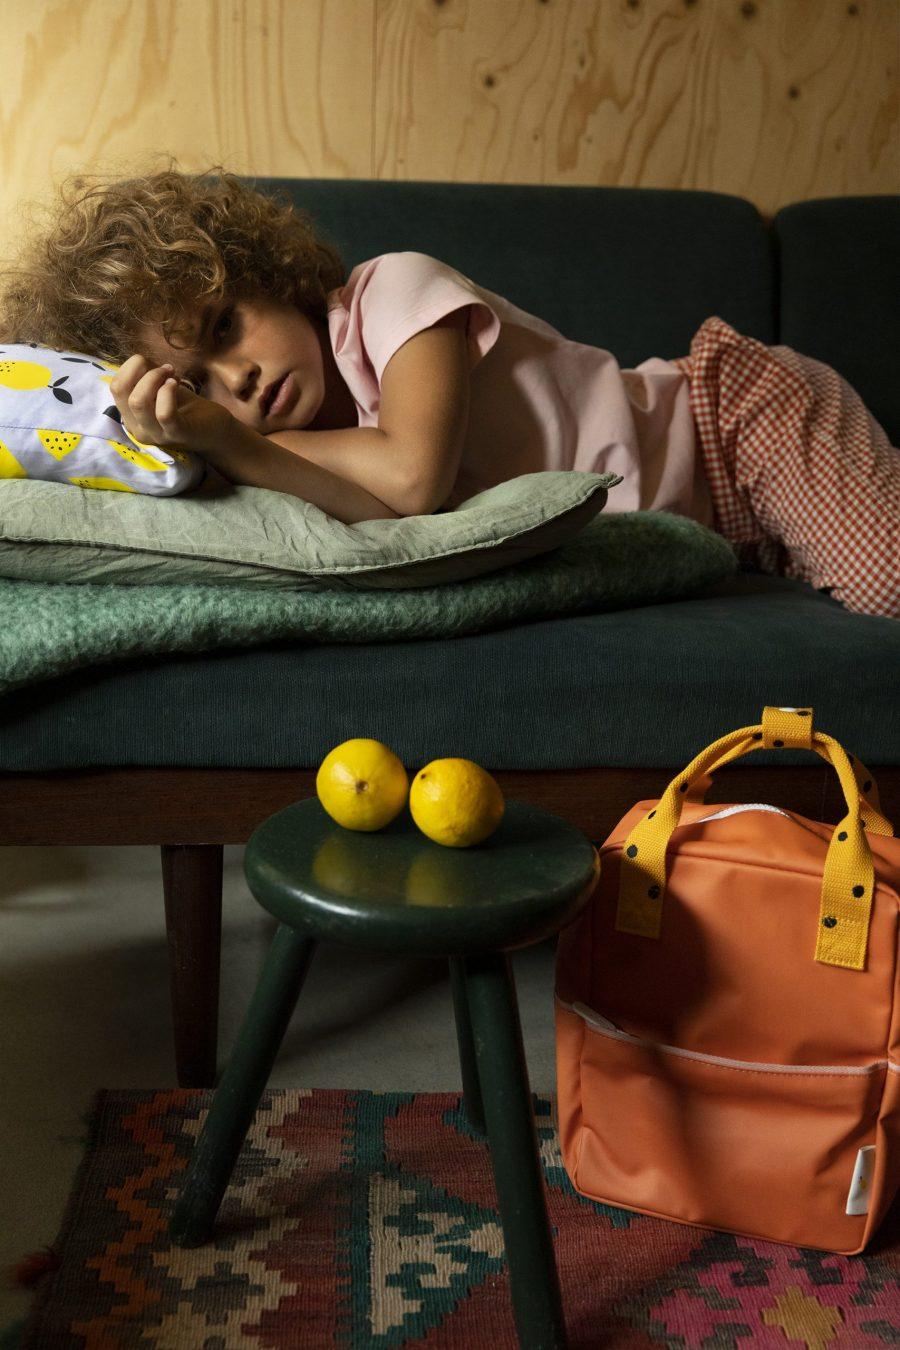 1801639 – Sticky Lemon – backpack small – freckles – carrot orange + sunny yellow – style shot 0